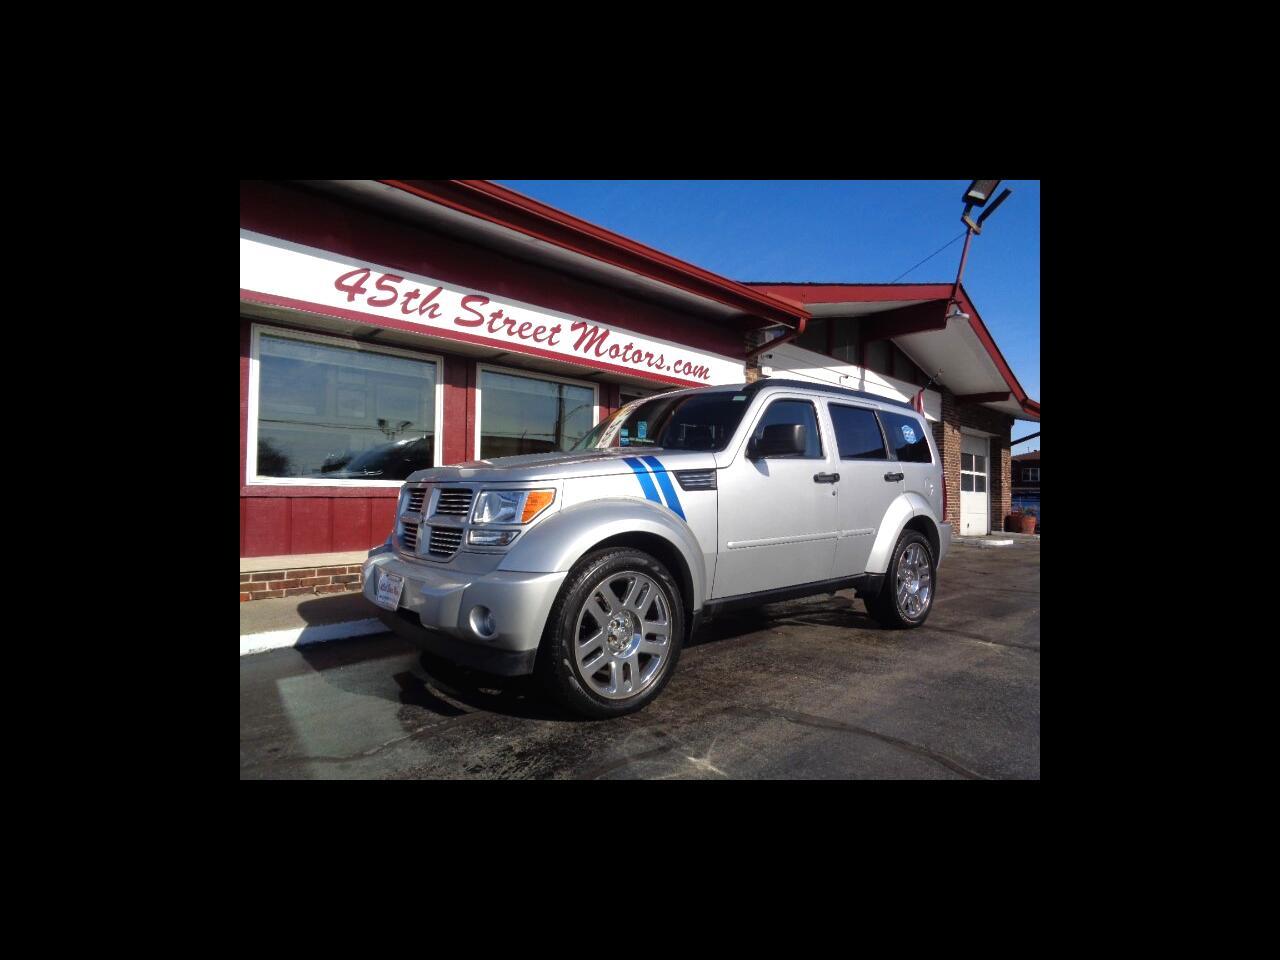 2011 Dodge Nitro 2WD 4dr Heat